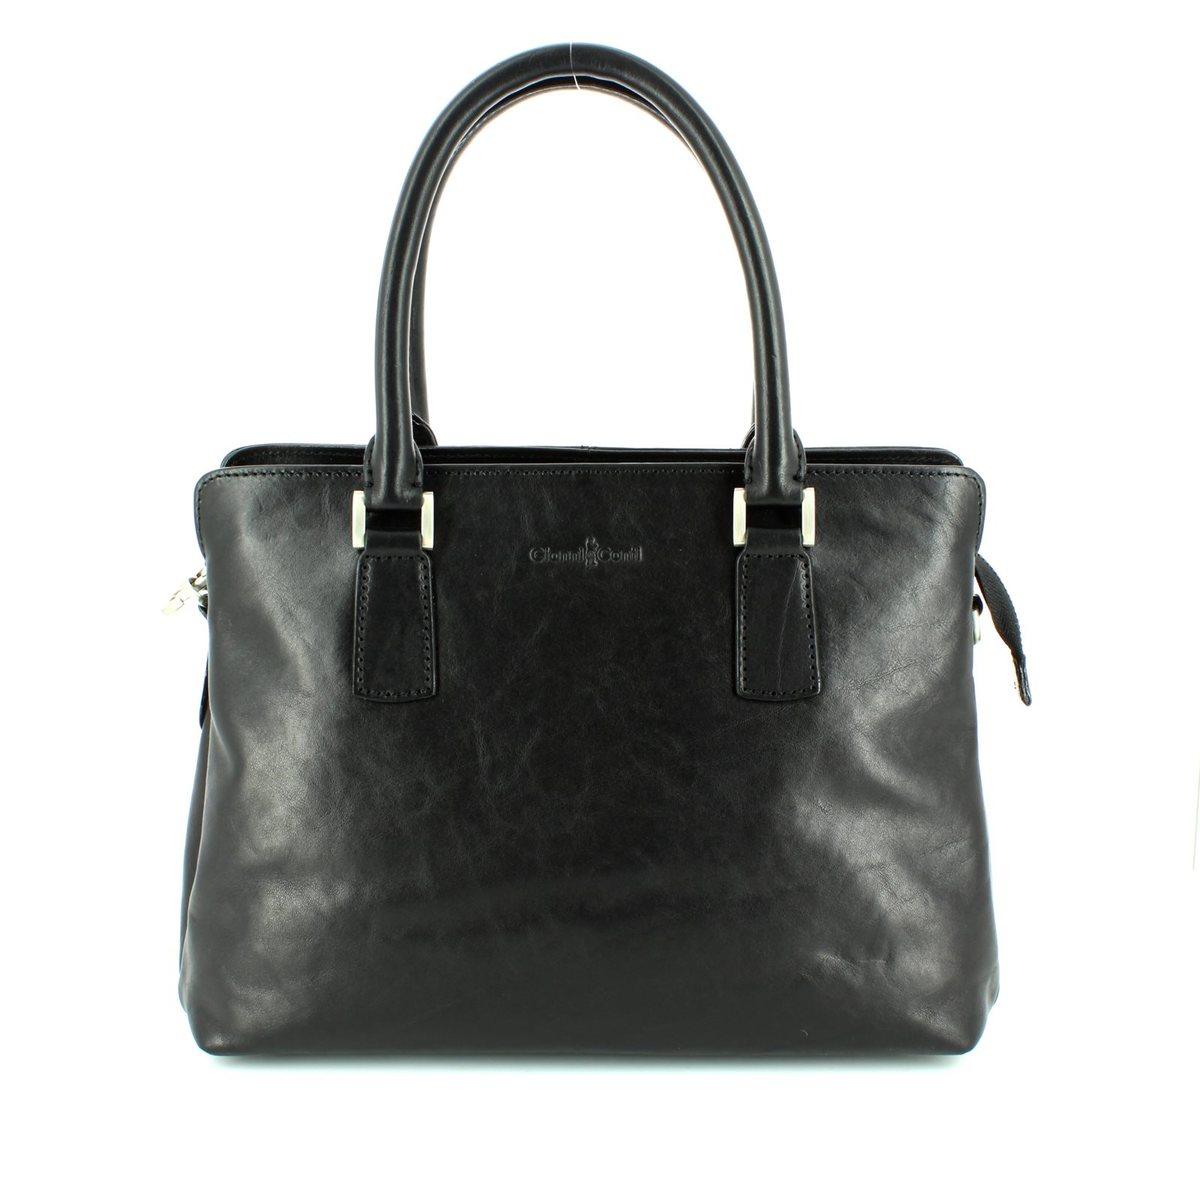 0aff2c7c9d3 Gianni Conti Handbag - Black - C913661/10 HOBO BUSINESS